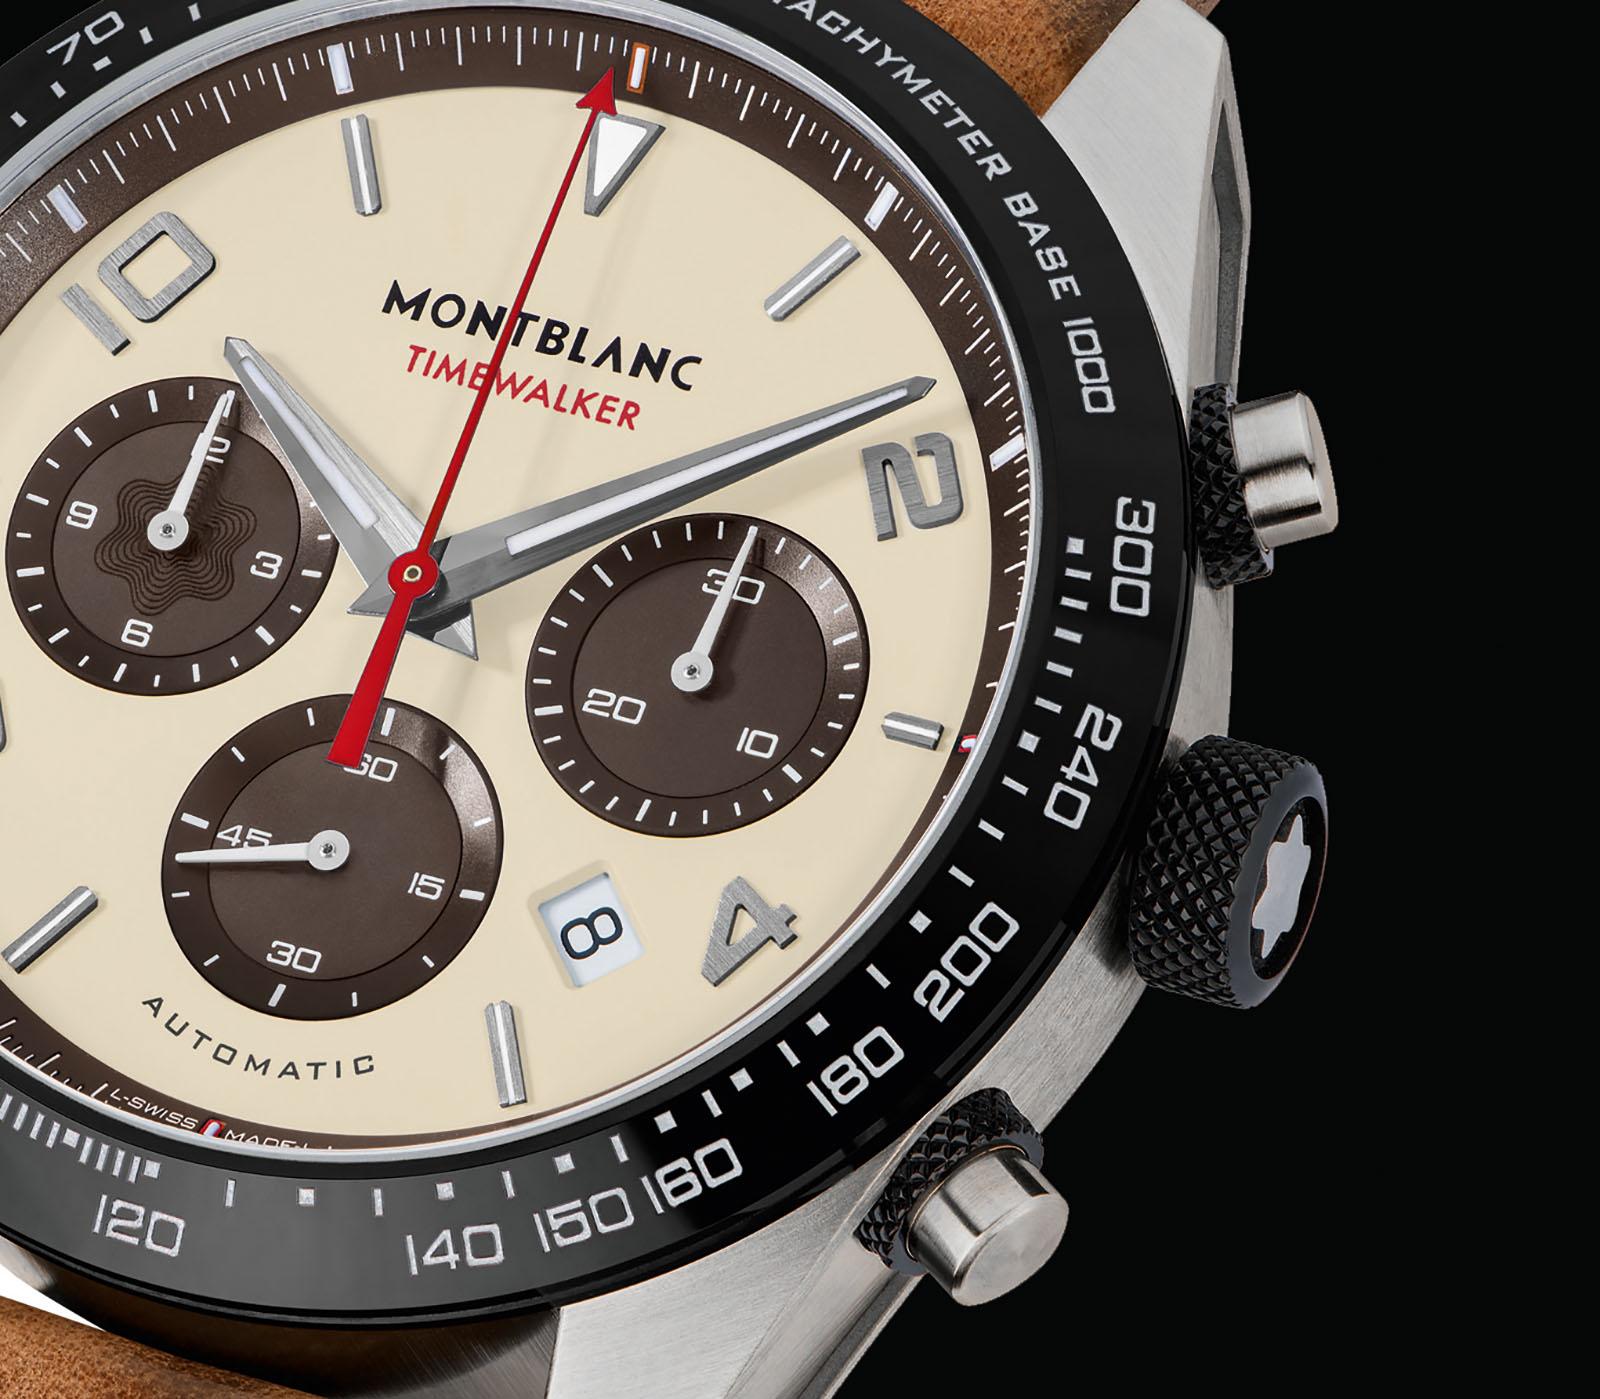 Montblanc TimeWalker Manufacture Chronograph 118491